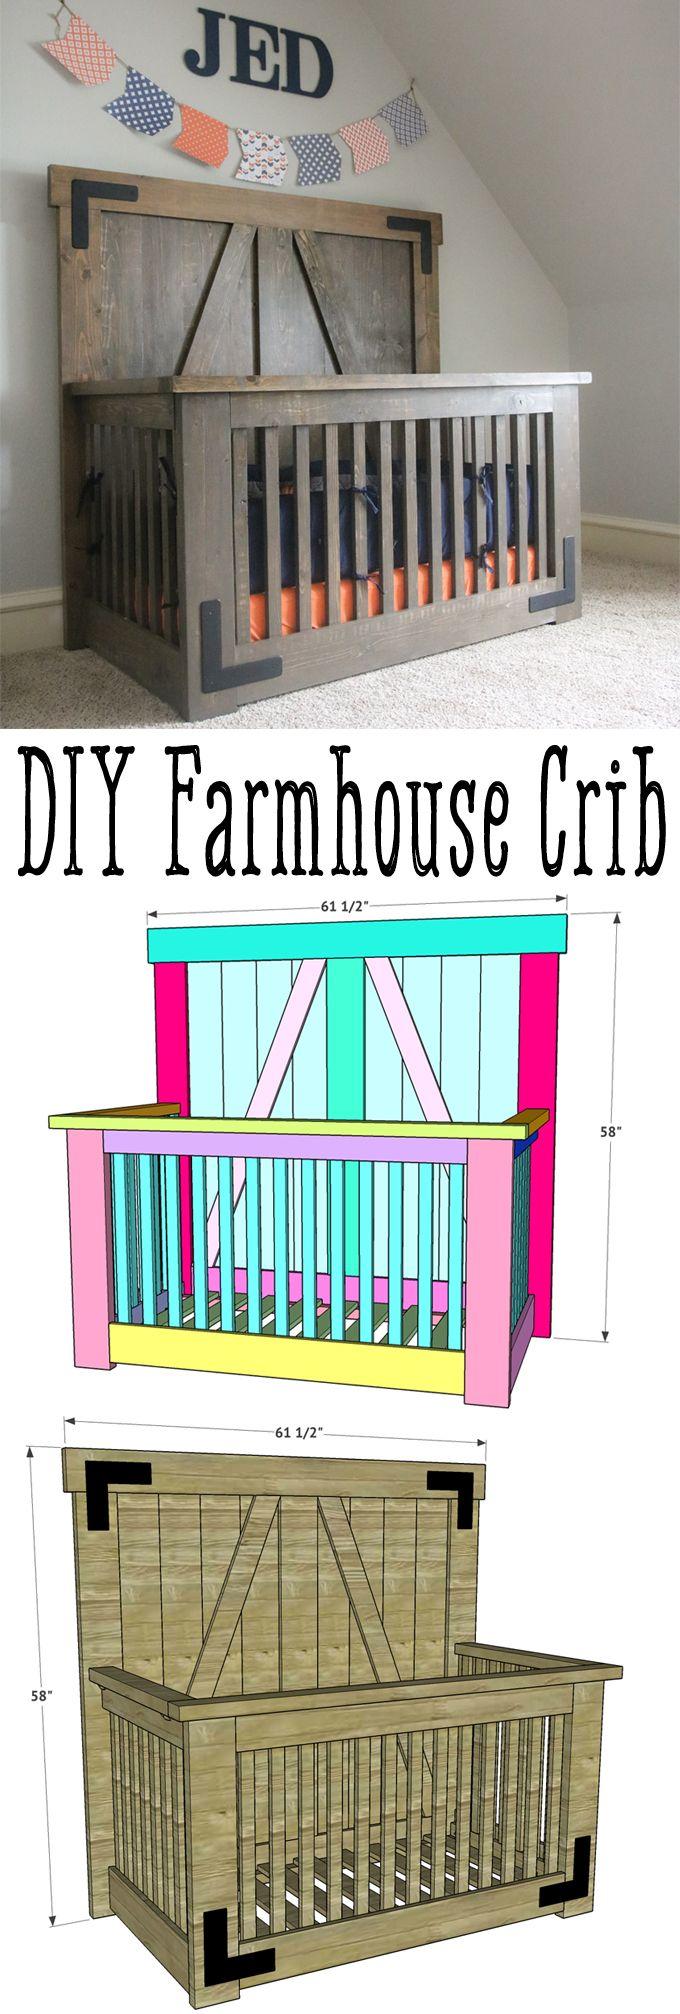 Diy Farmhouse Crib Baby Cribs